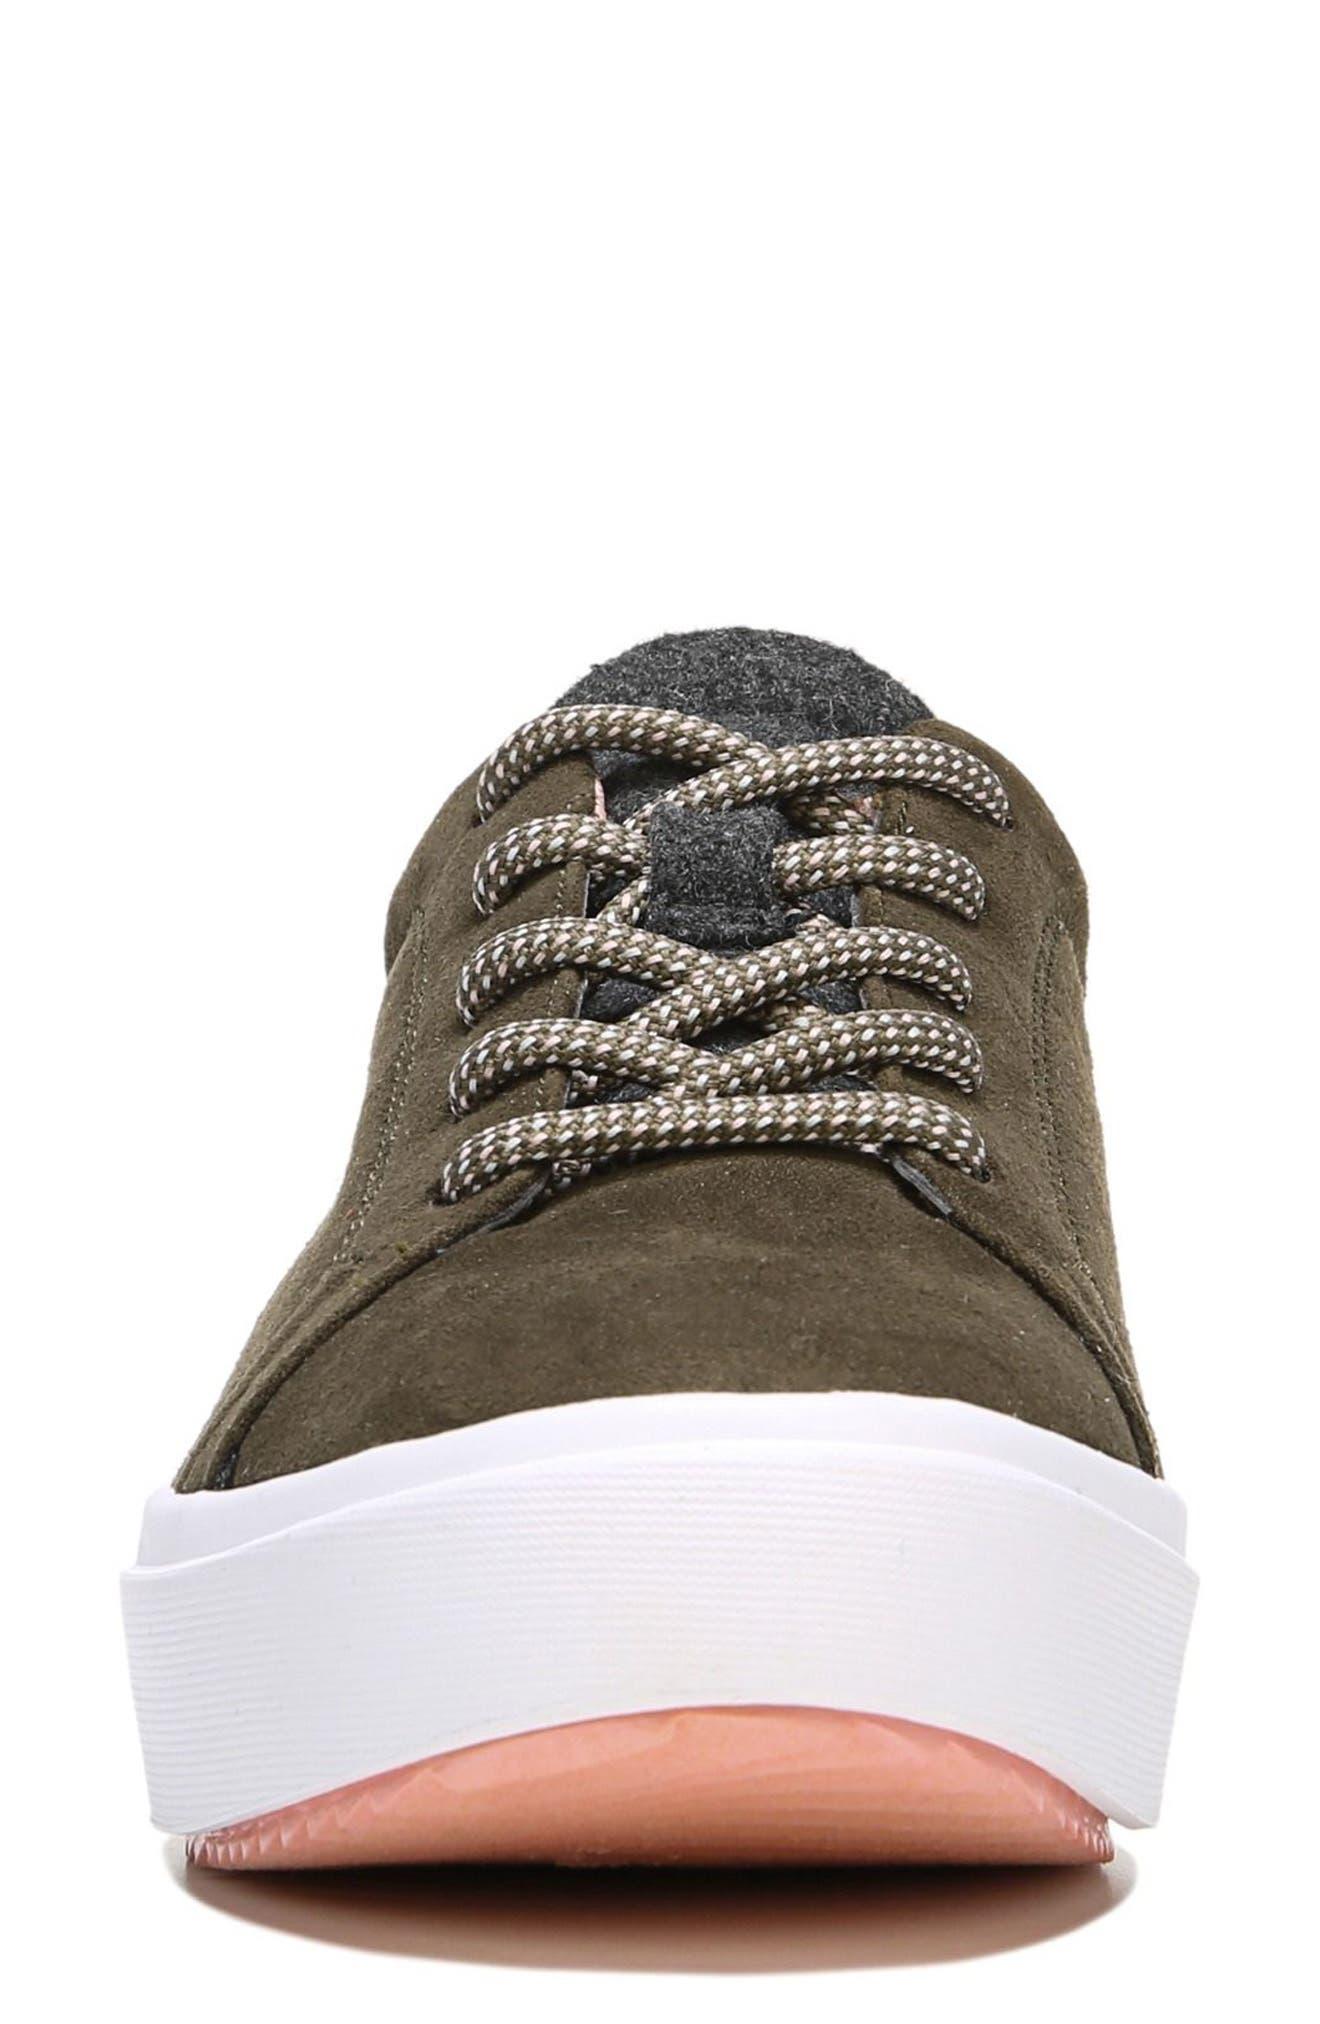 Wander Sneaker,                             Alternate thumbnail 3, color,                             020